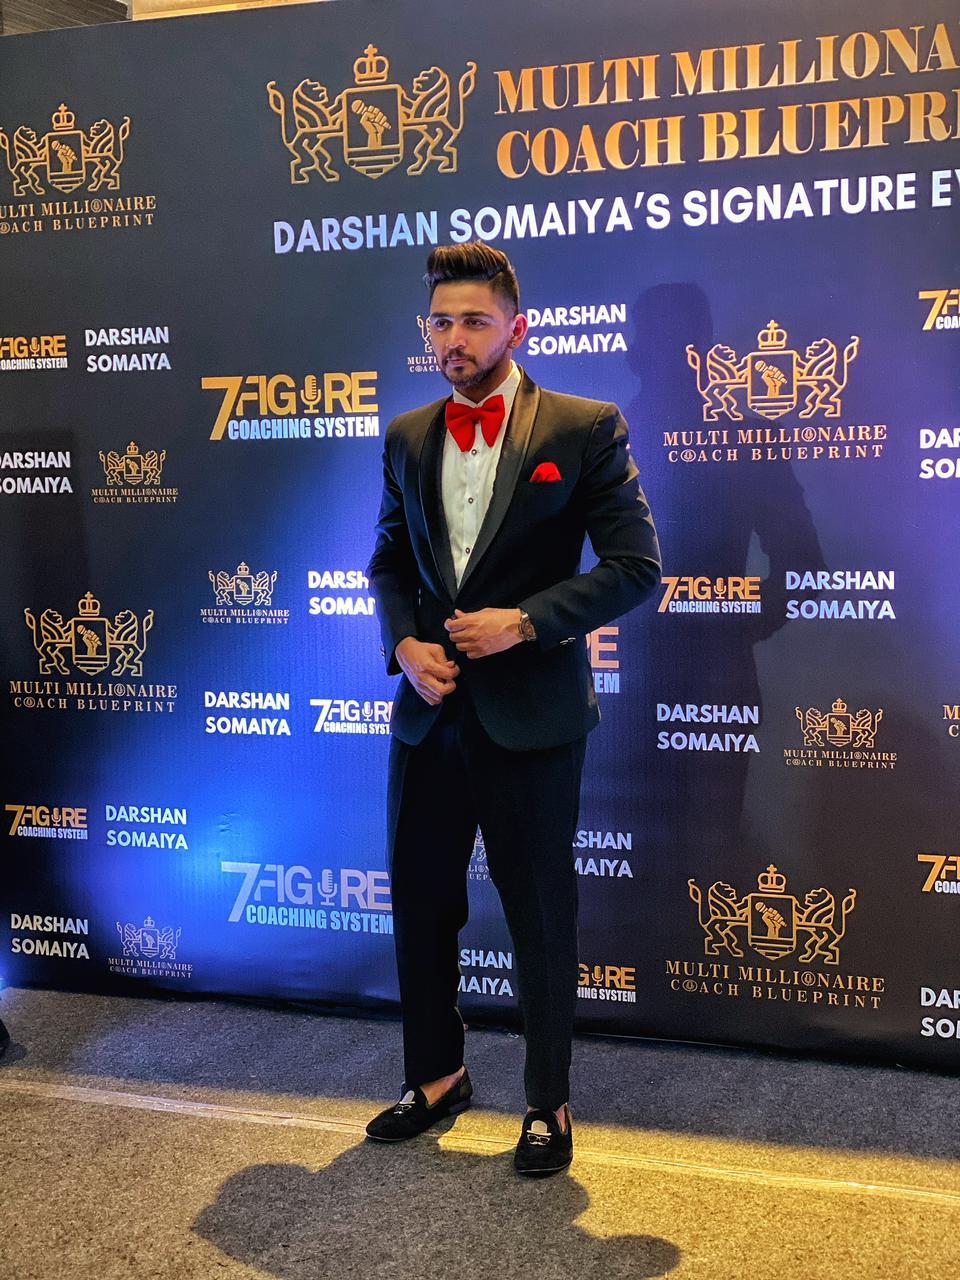 Darshan Somaiya: The Saga of the Millionaire Mentor